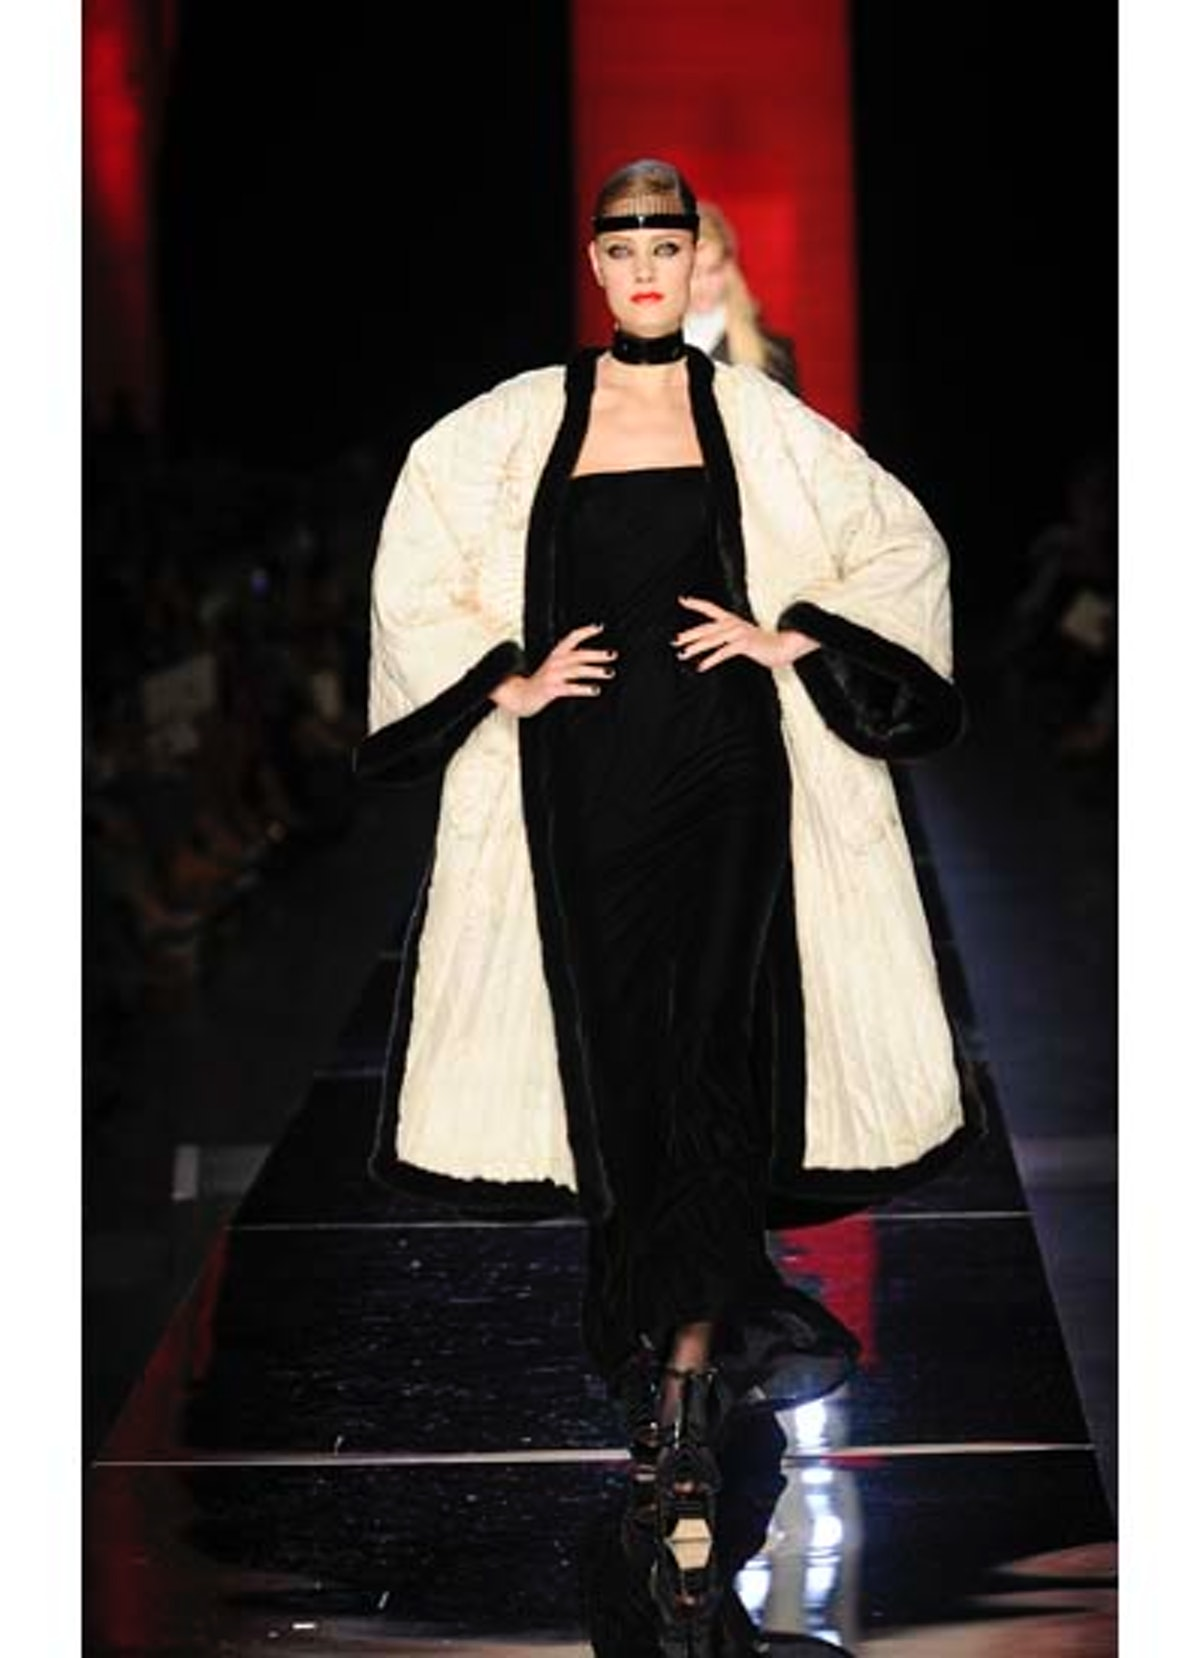 fass-jean-paul-gaultier-couture-2012-runway-38-v.jpg